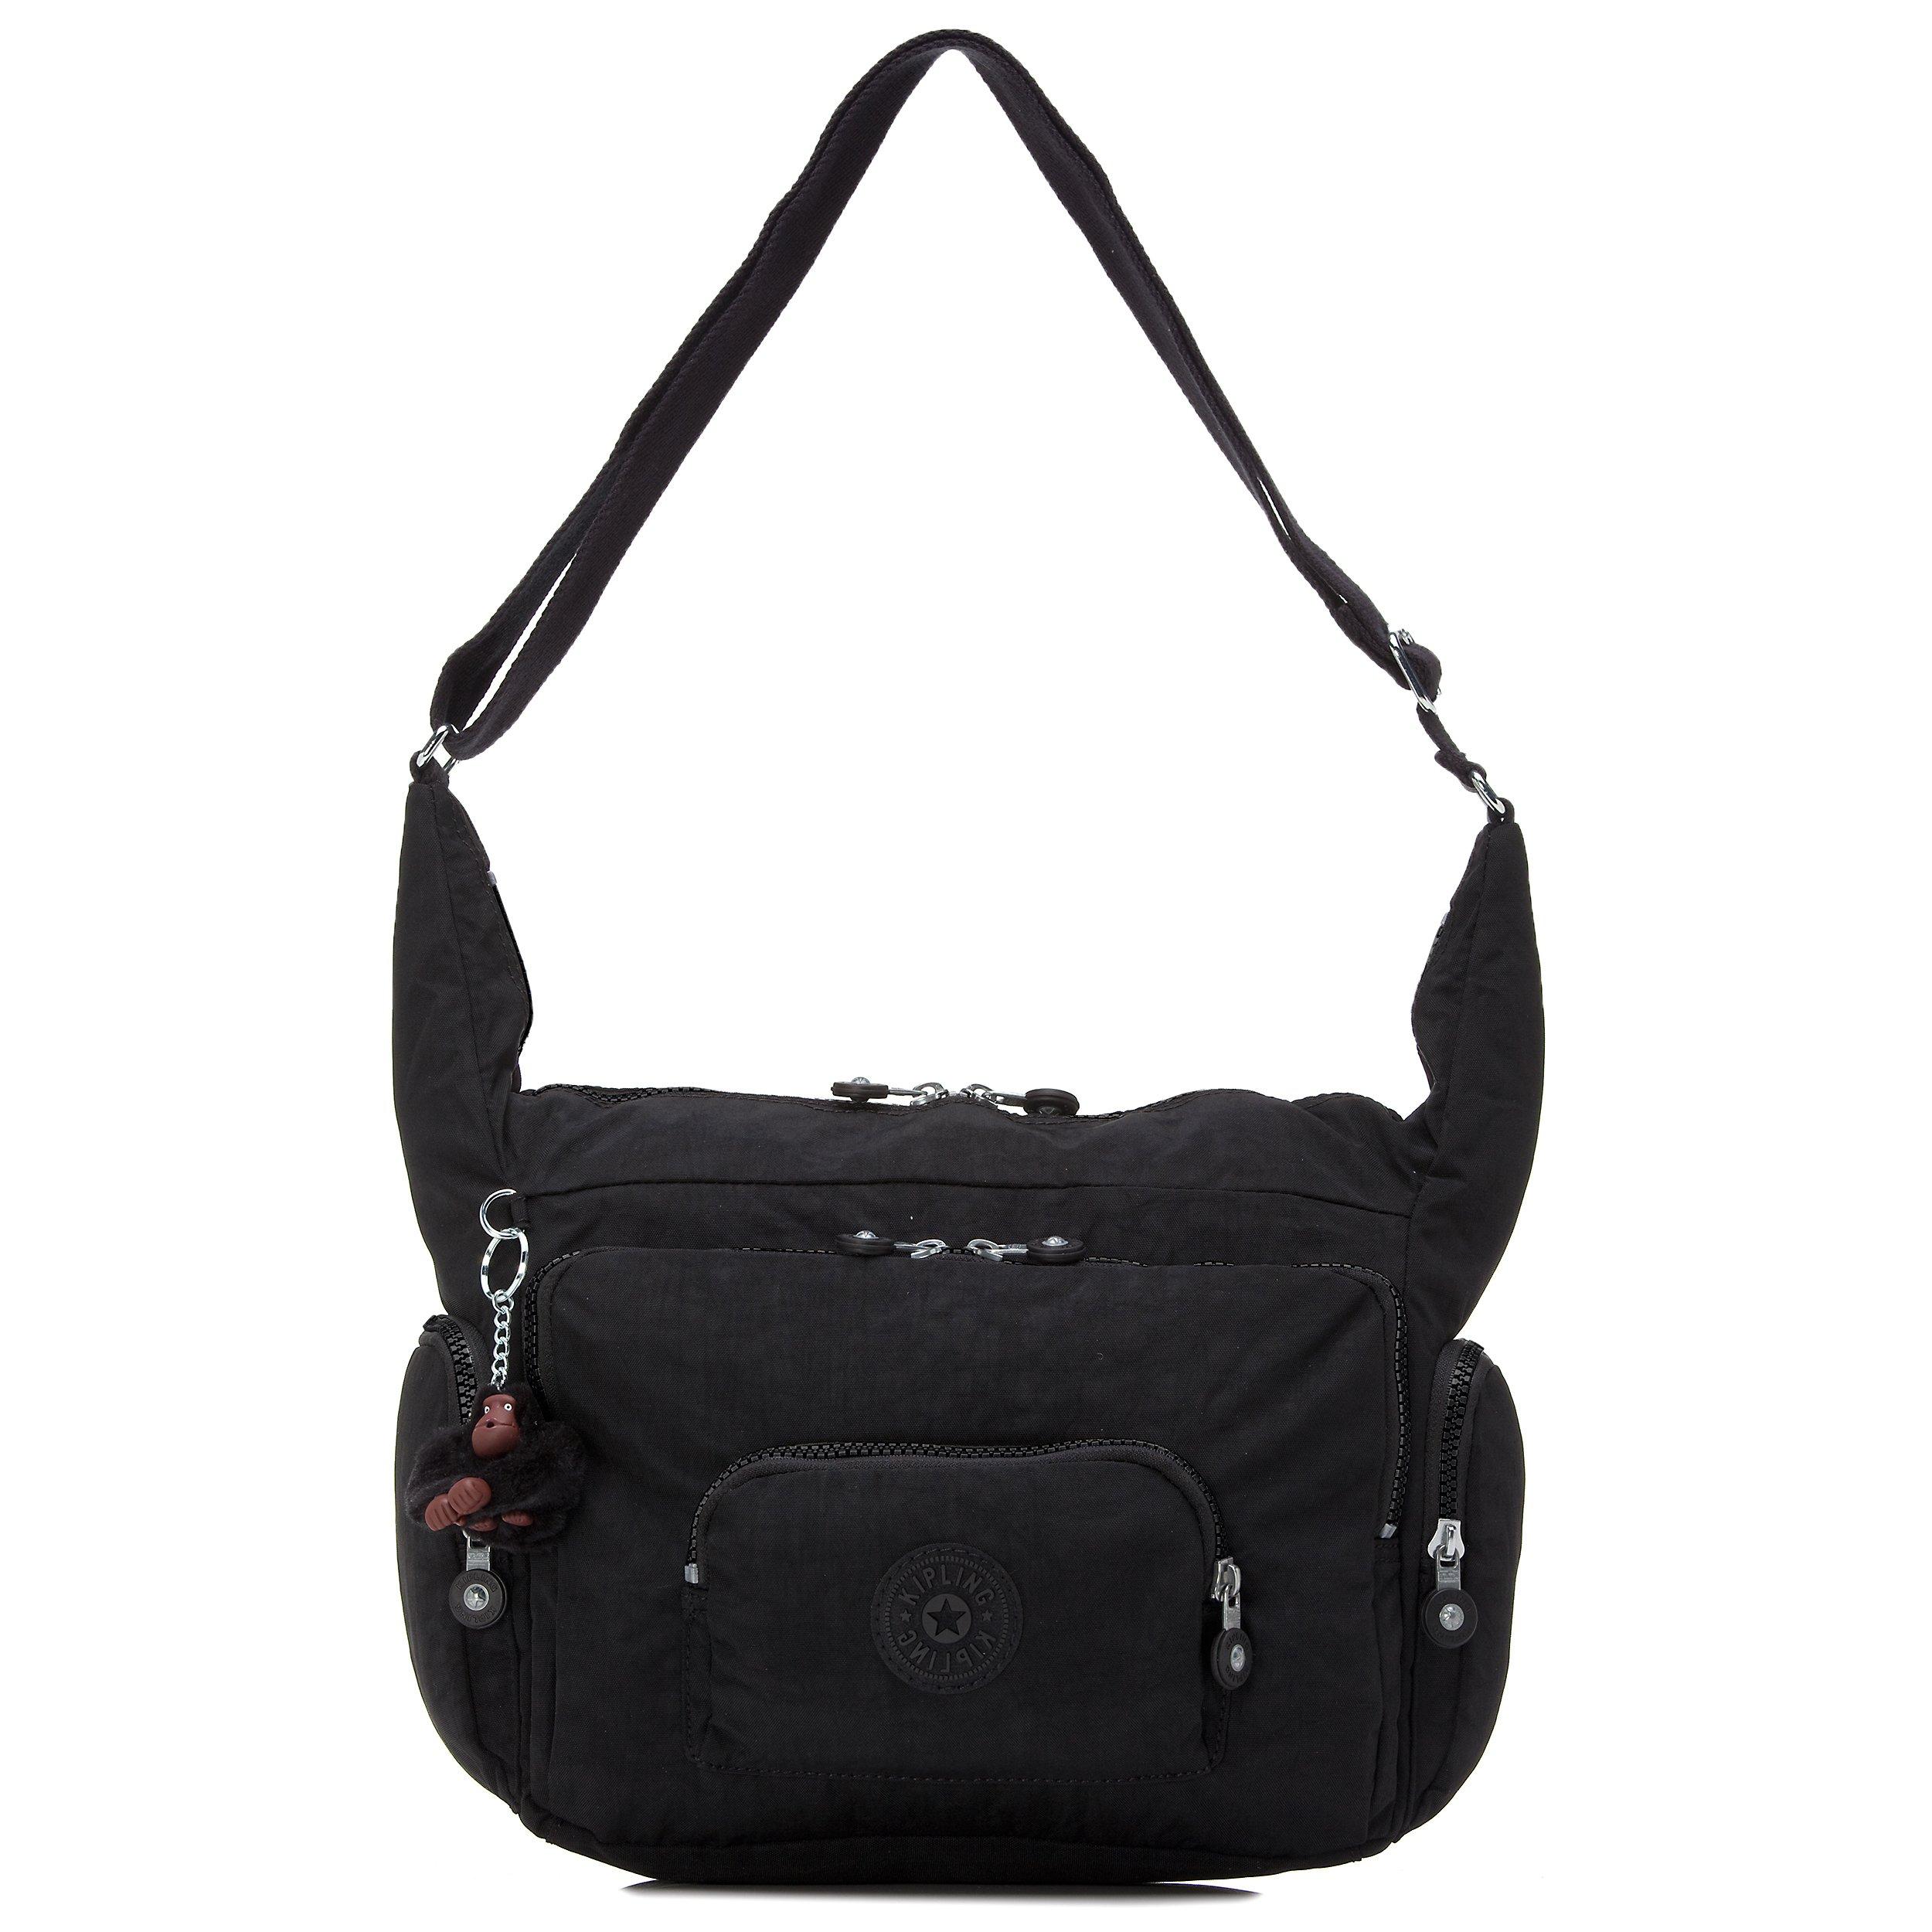 Kipling Erica Black Tonal Crossbody Bag, Black t